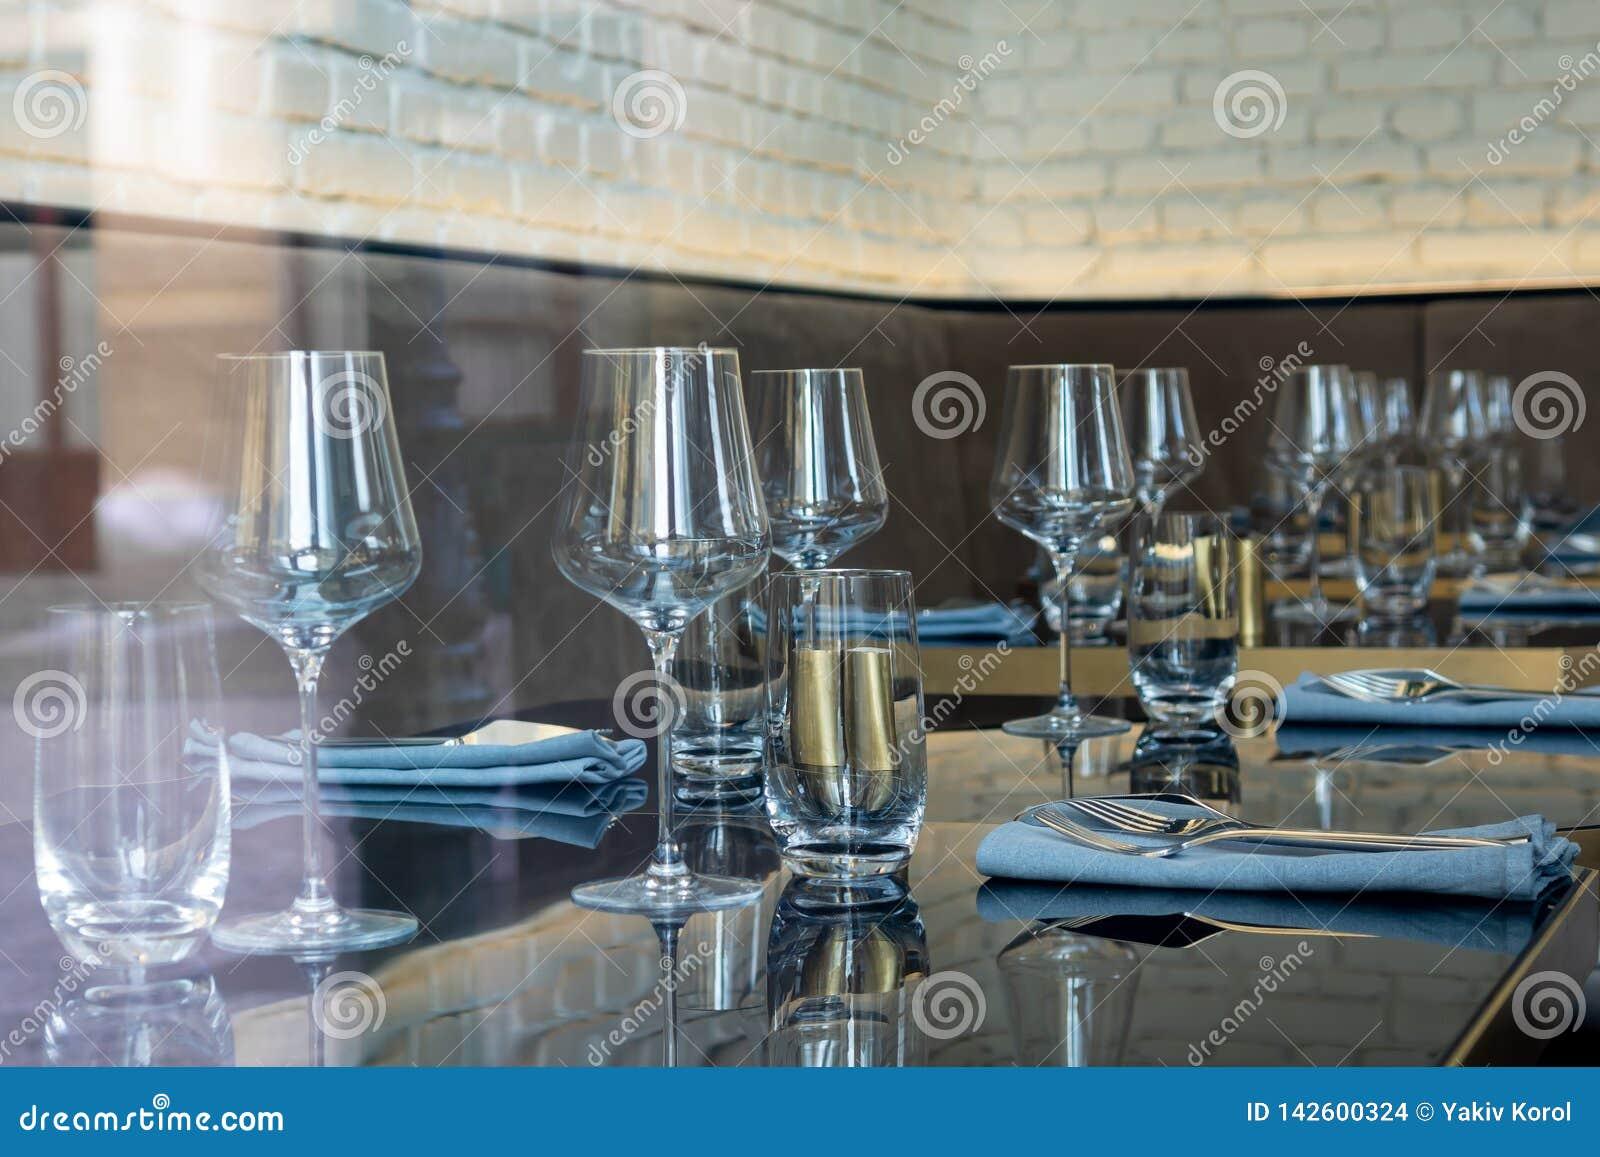 Festive table setting. Empty glasses, cutlery